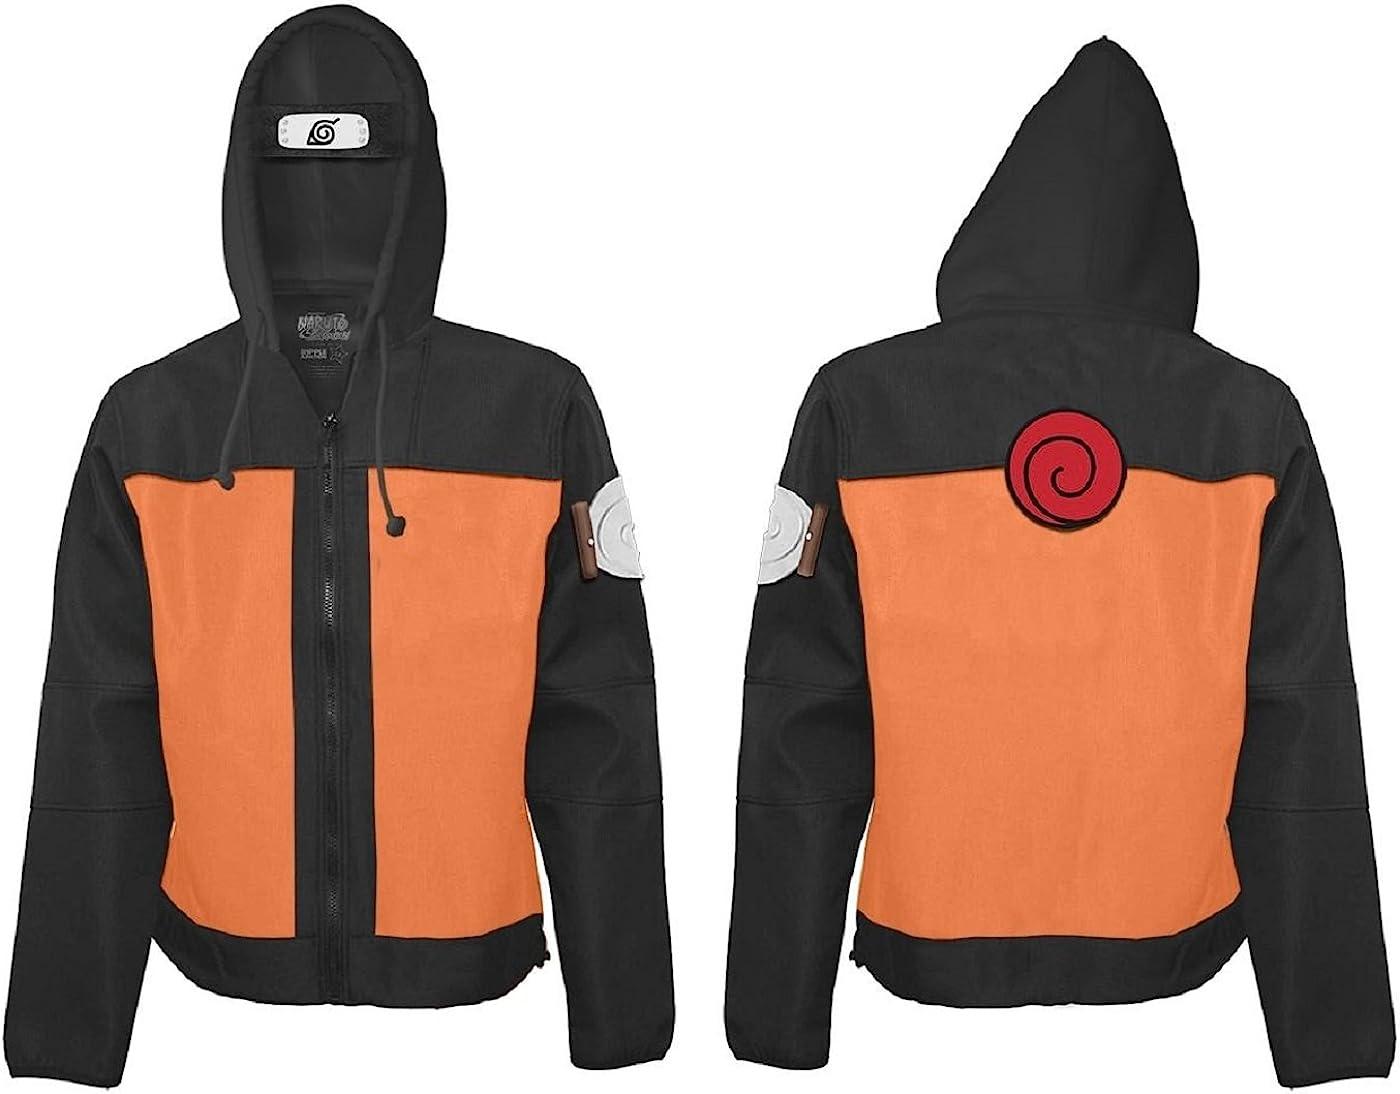 Naruto Shippuden Ninja Adult Zip Hoodie